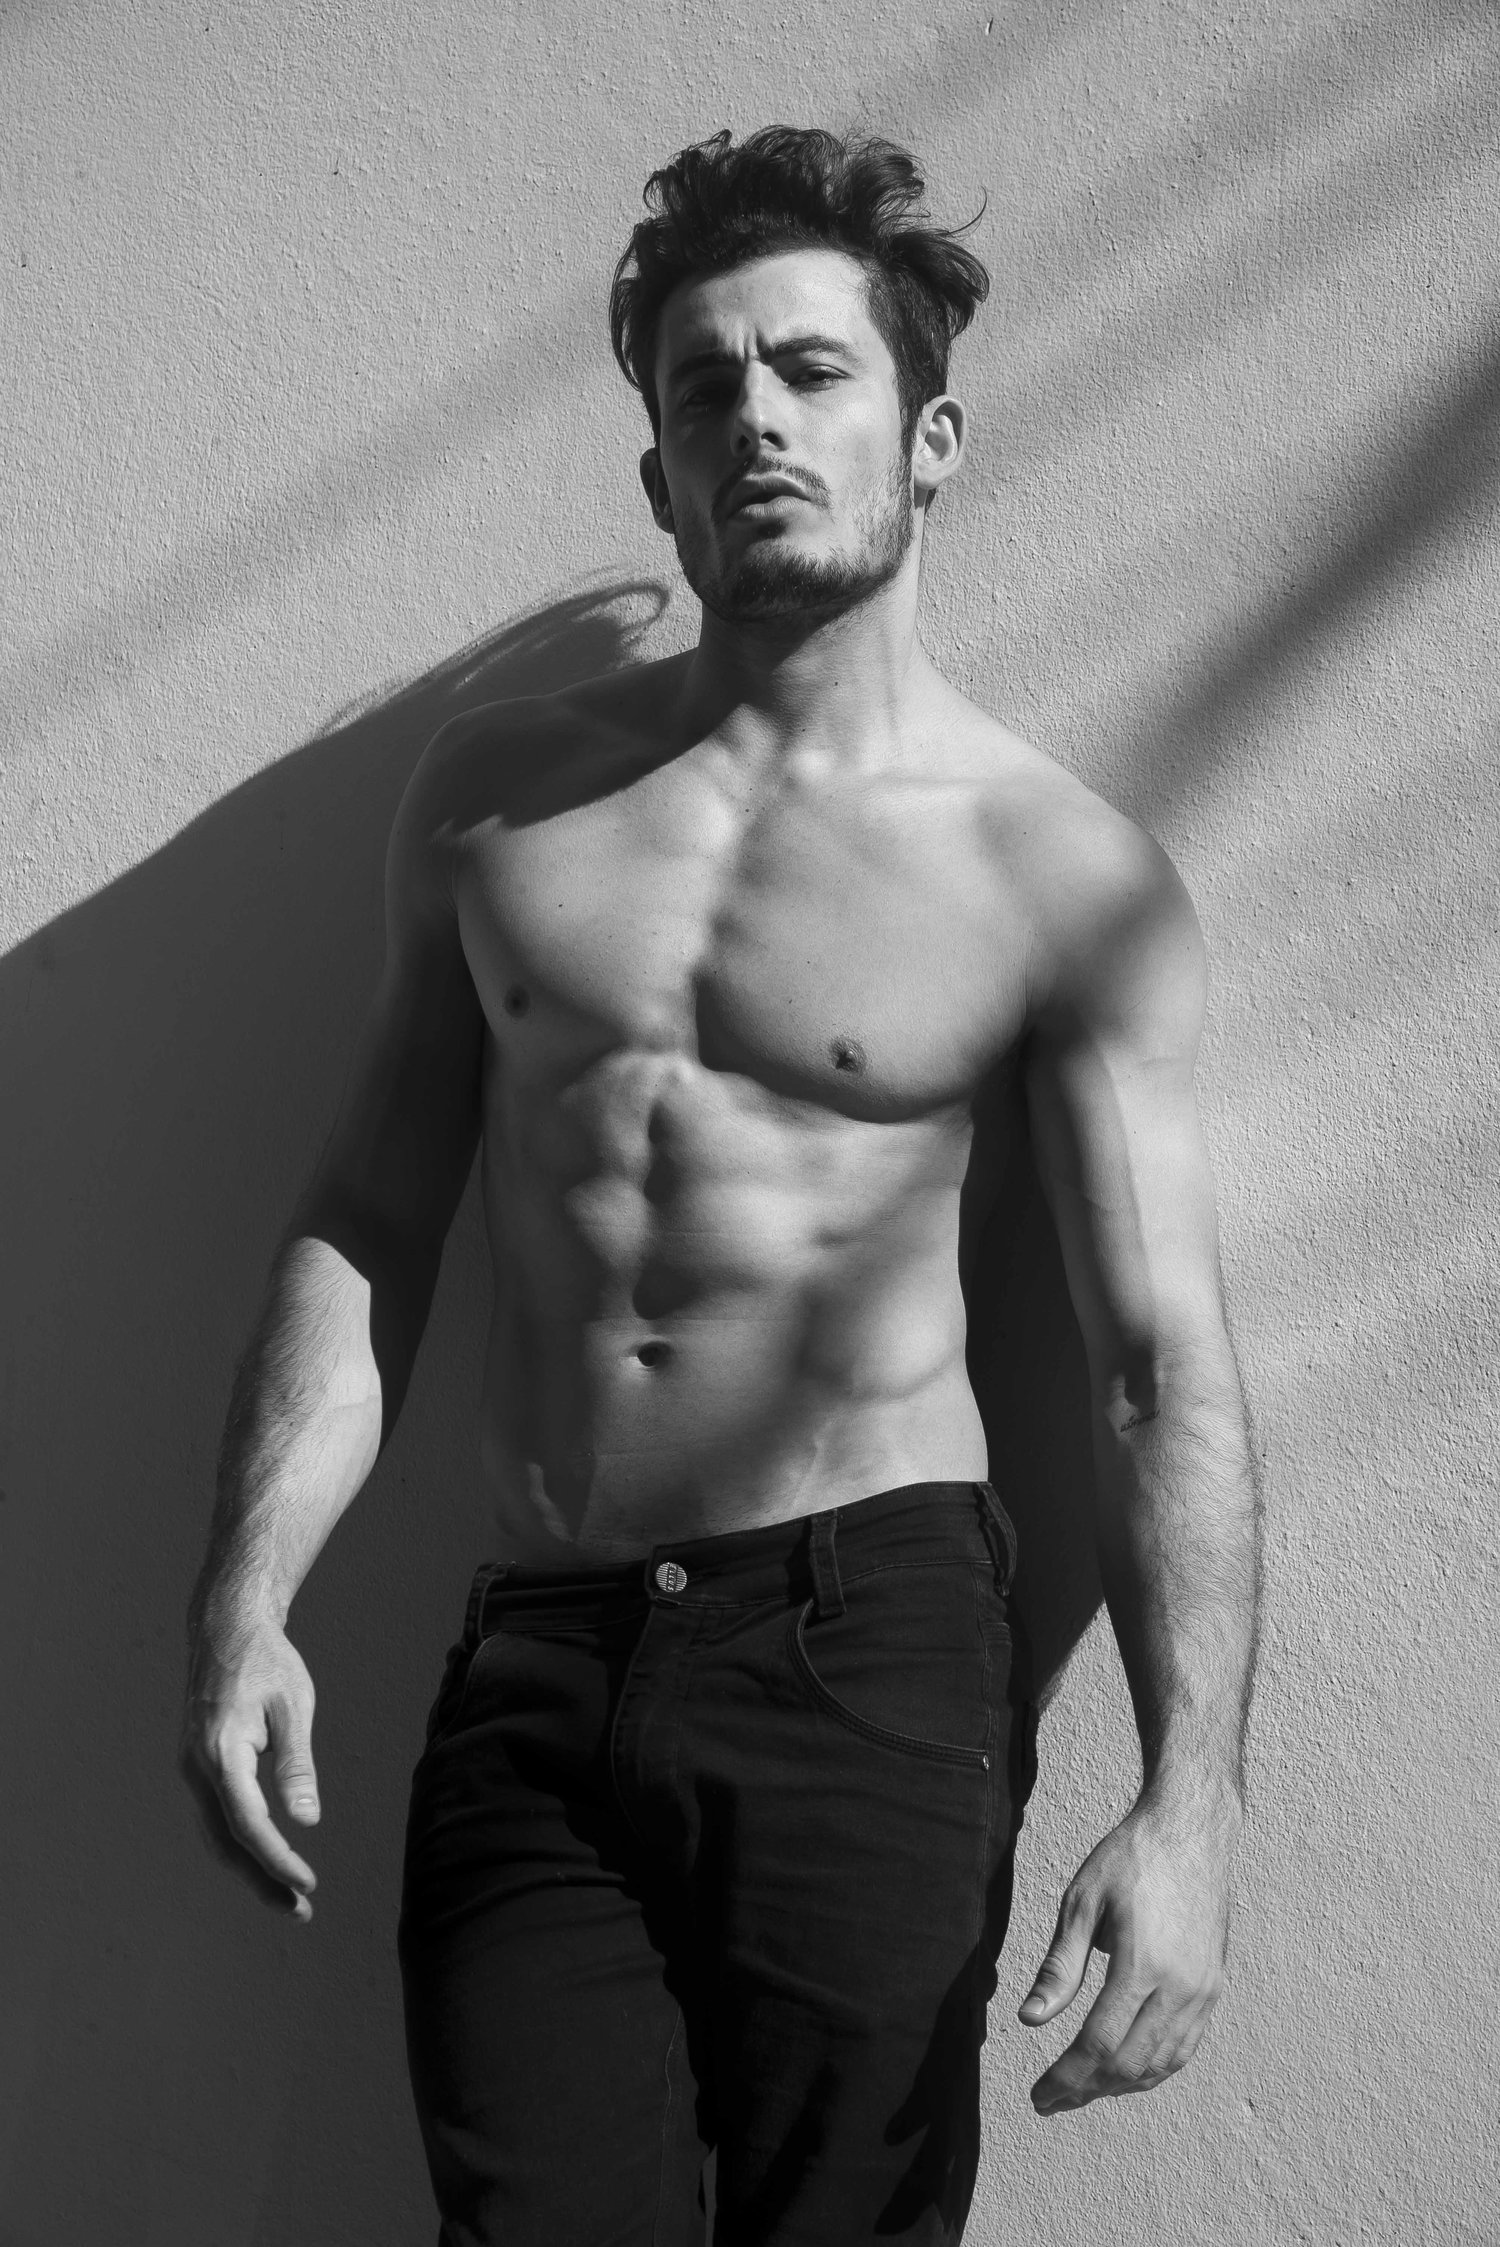 Adon Exclusive: Model Pedro Fernandez By Fernanda Torchetti